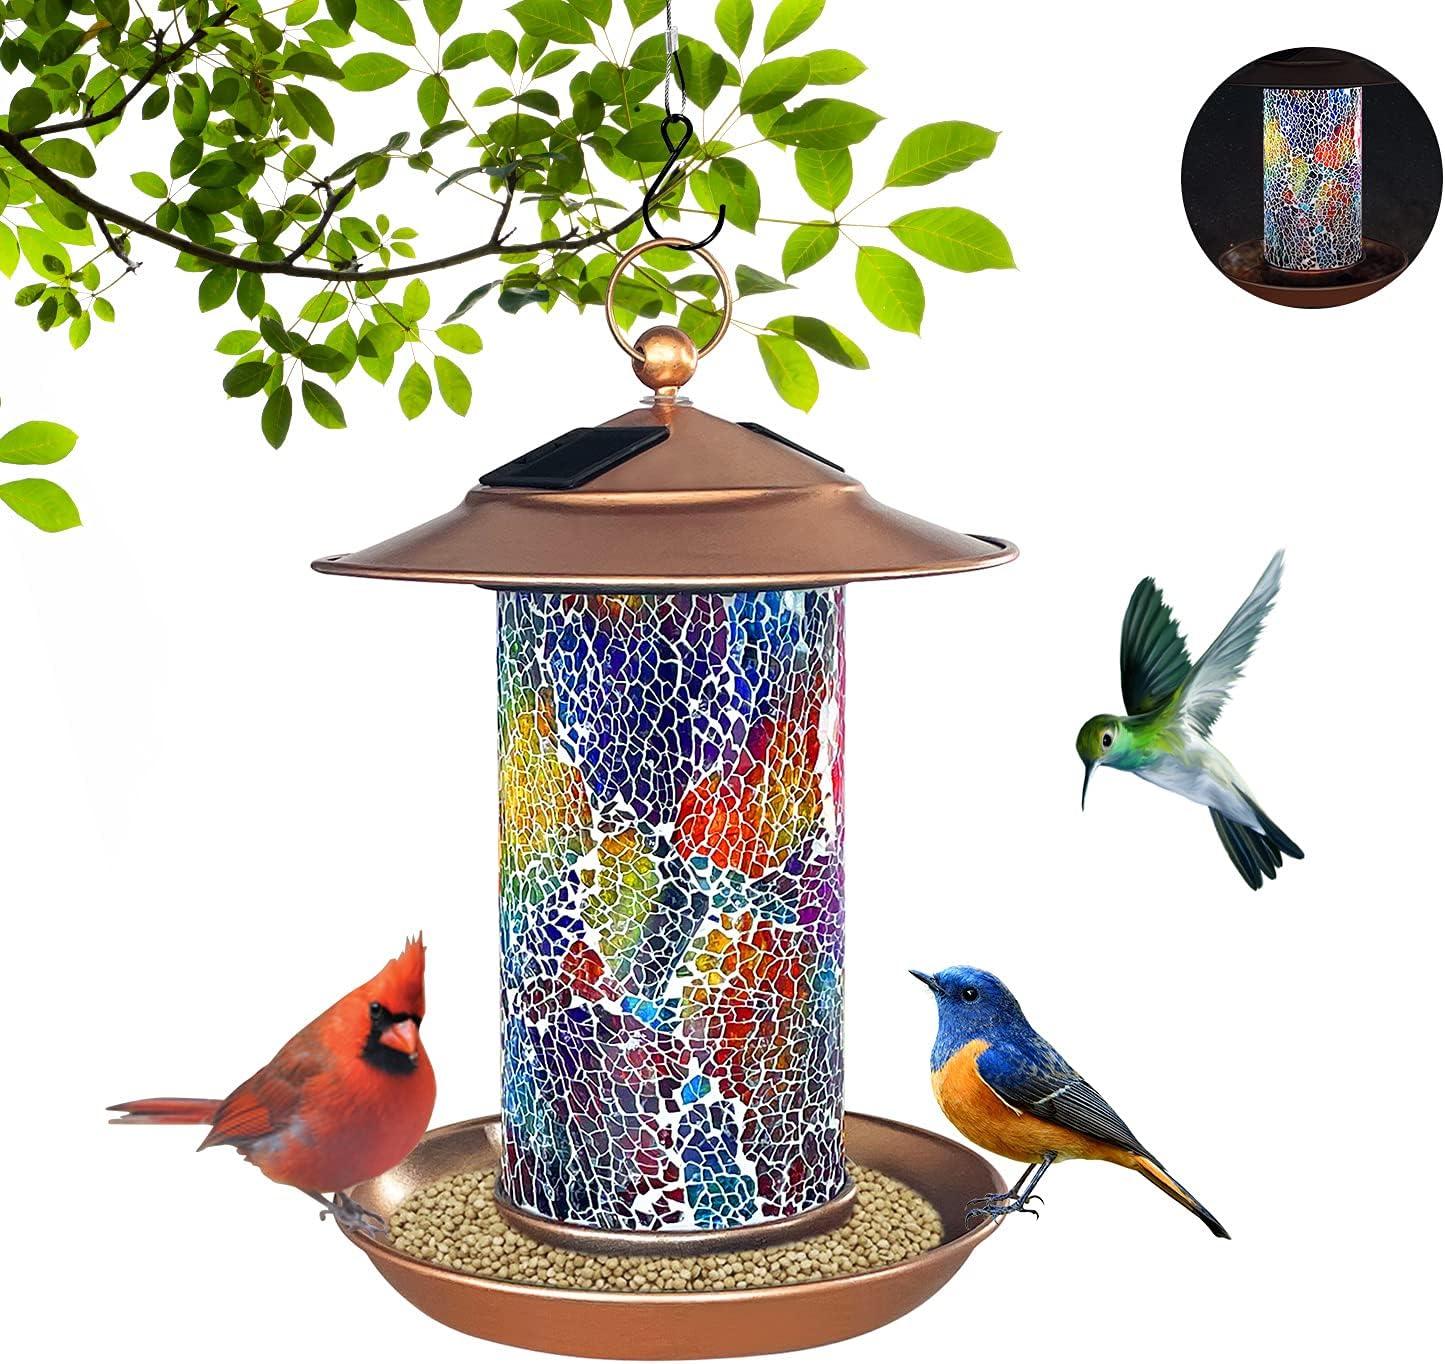 Solar Bird Feeder, FURANDE Outdoor Hanging Wild Birdfeeder with Colorful Glass Mosaic Decor, Waterproof Solar Powered Garden Lantern Copper Bird House with Hook as Gift Ideas for Bird Lovers